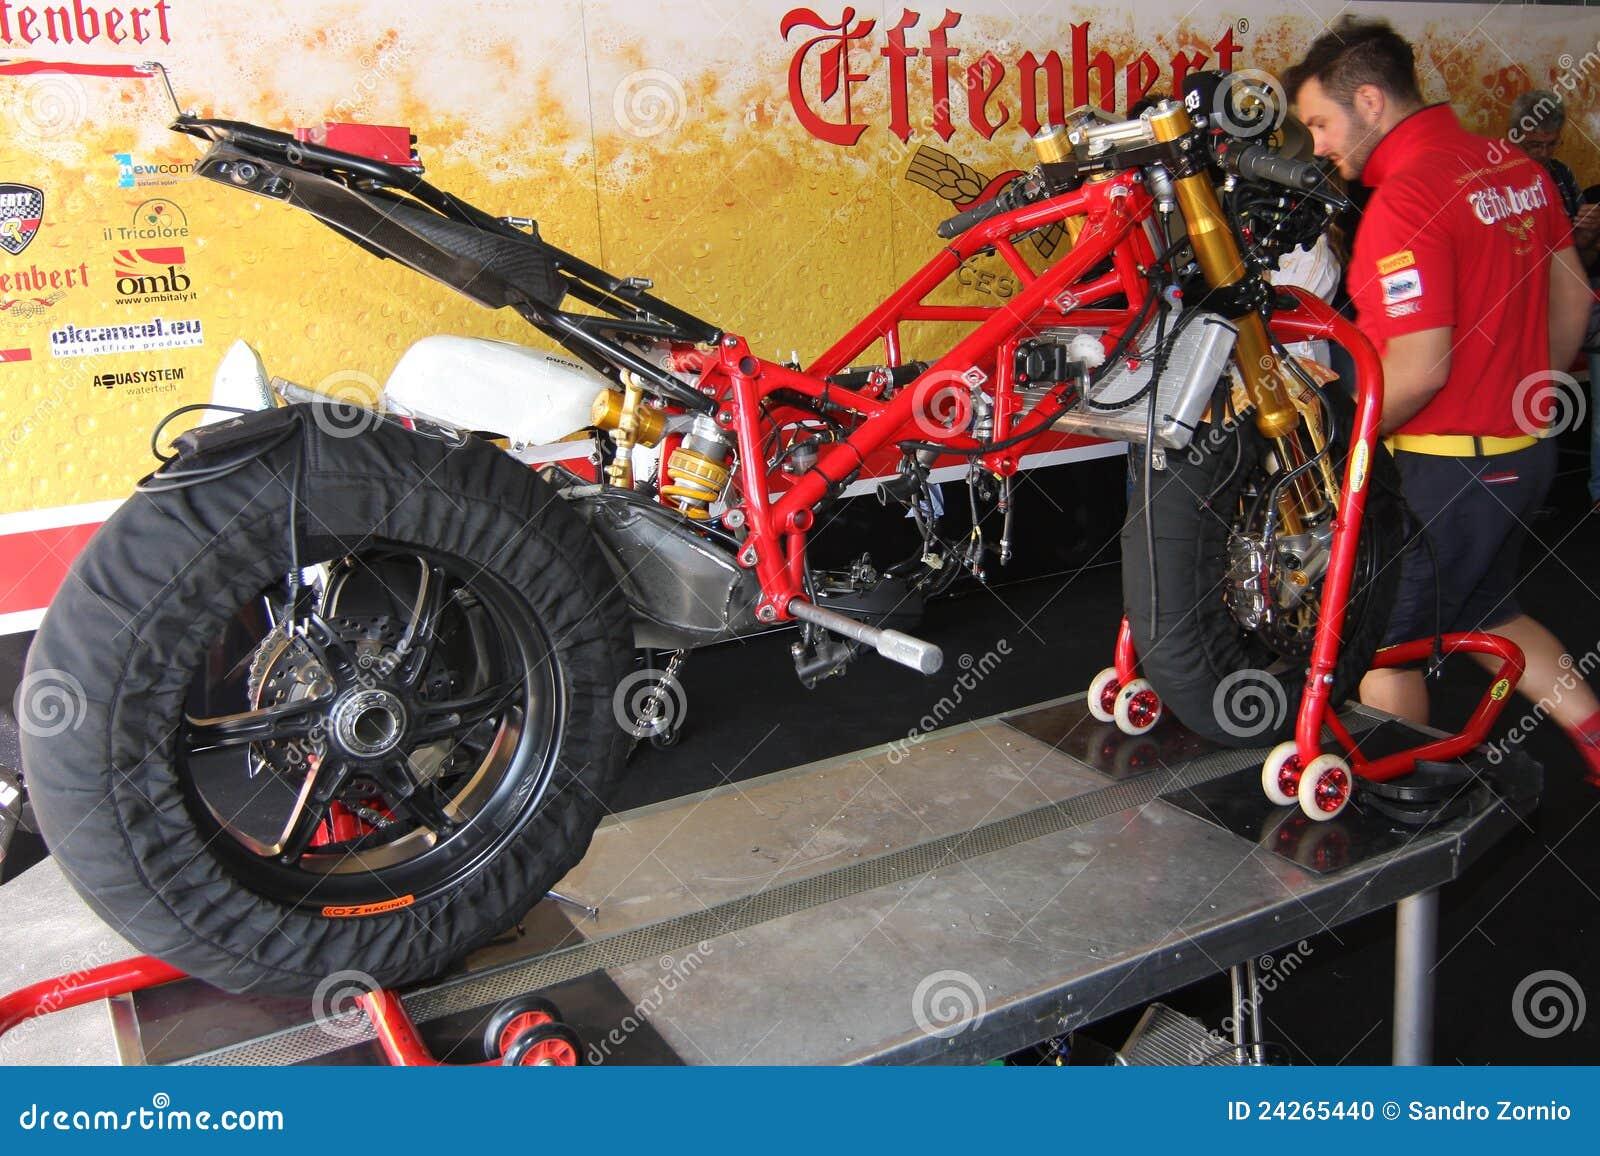 Ducati 1098R Effenbert Liberty without engine